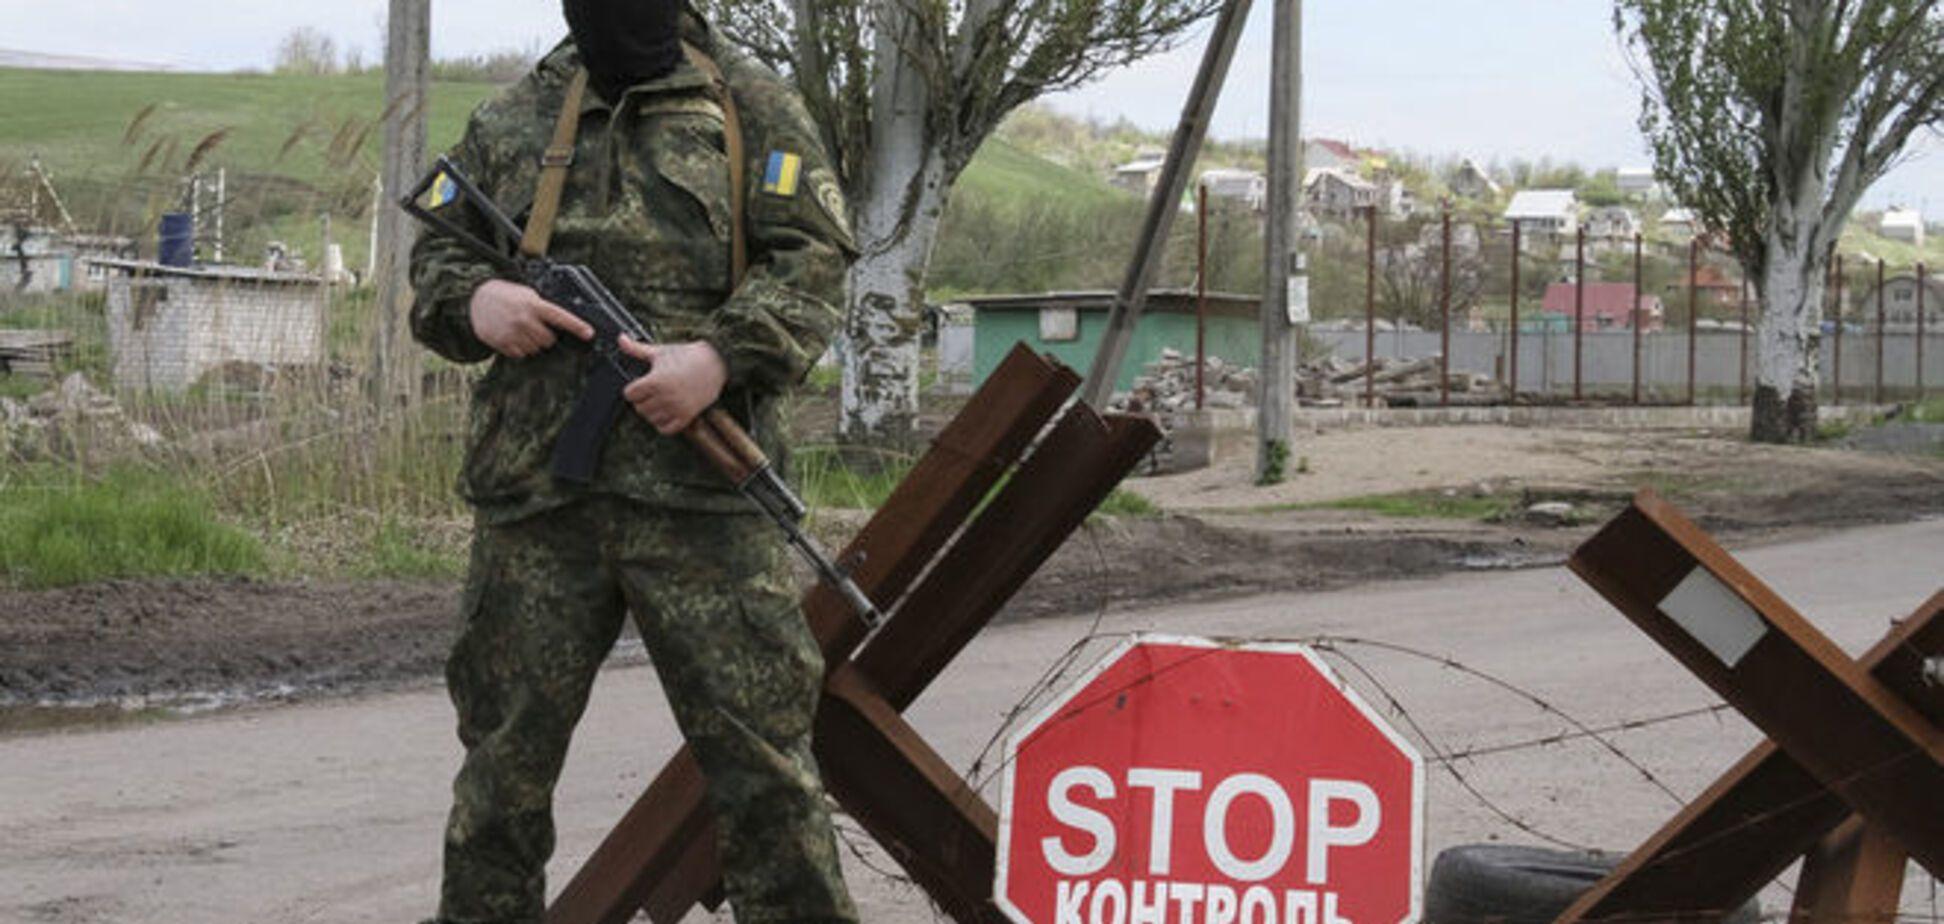 В бою с террористами в Крымском ранен боец Нацгвардии